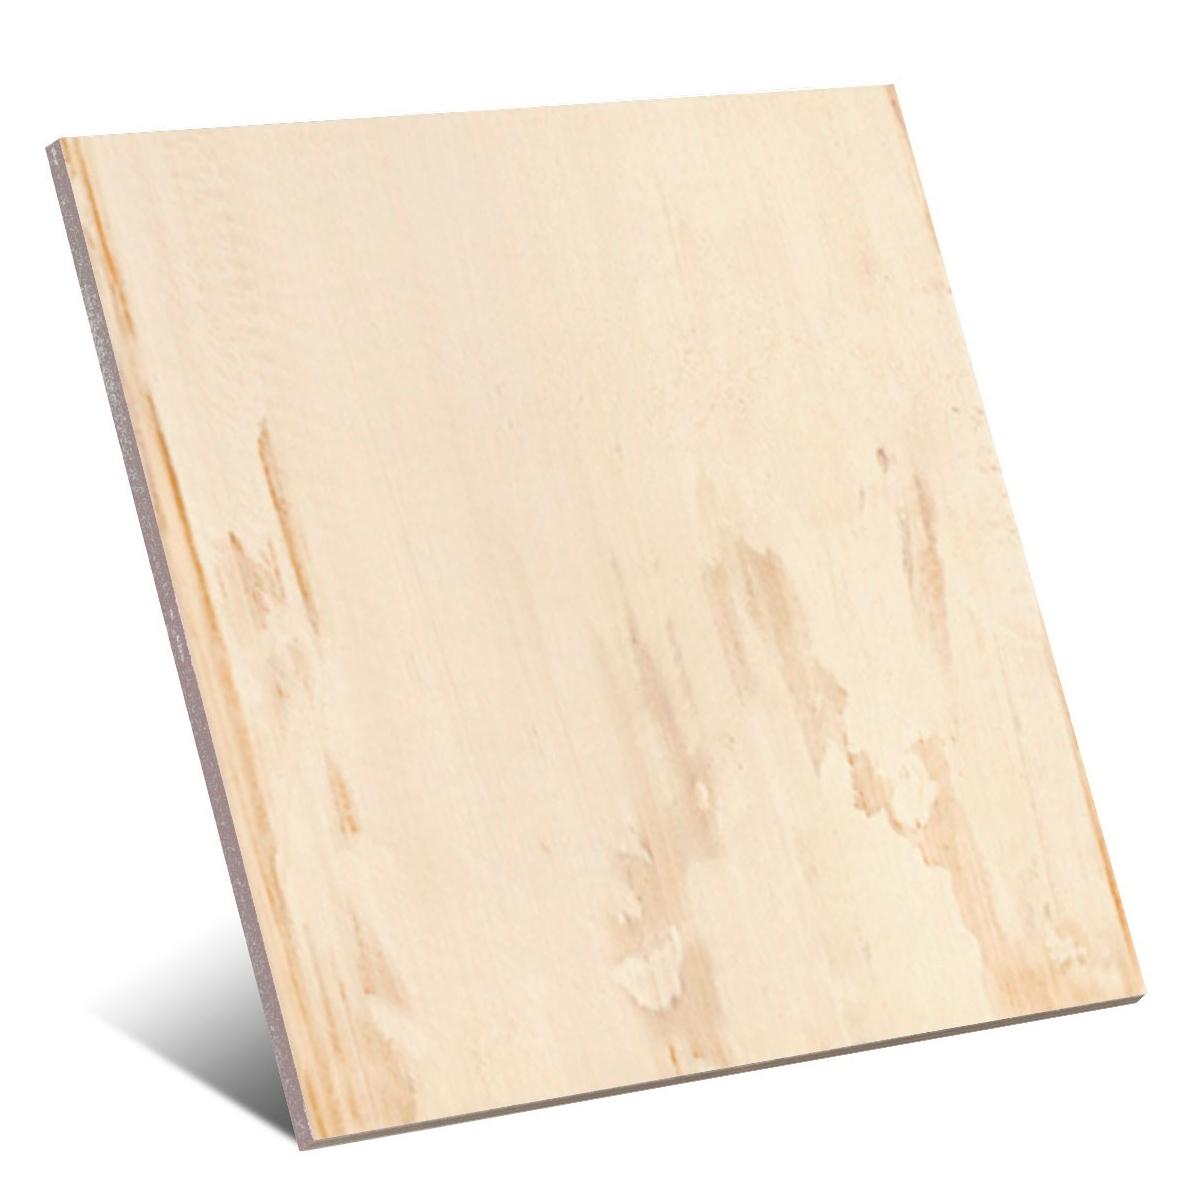 Pavimento Pacific Blanco 20x20 (caja 1 m2)